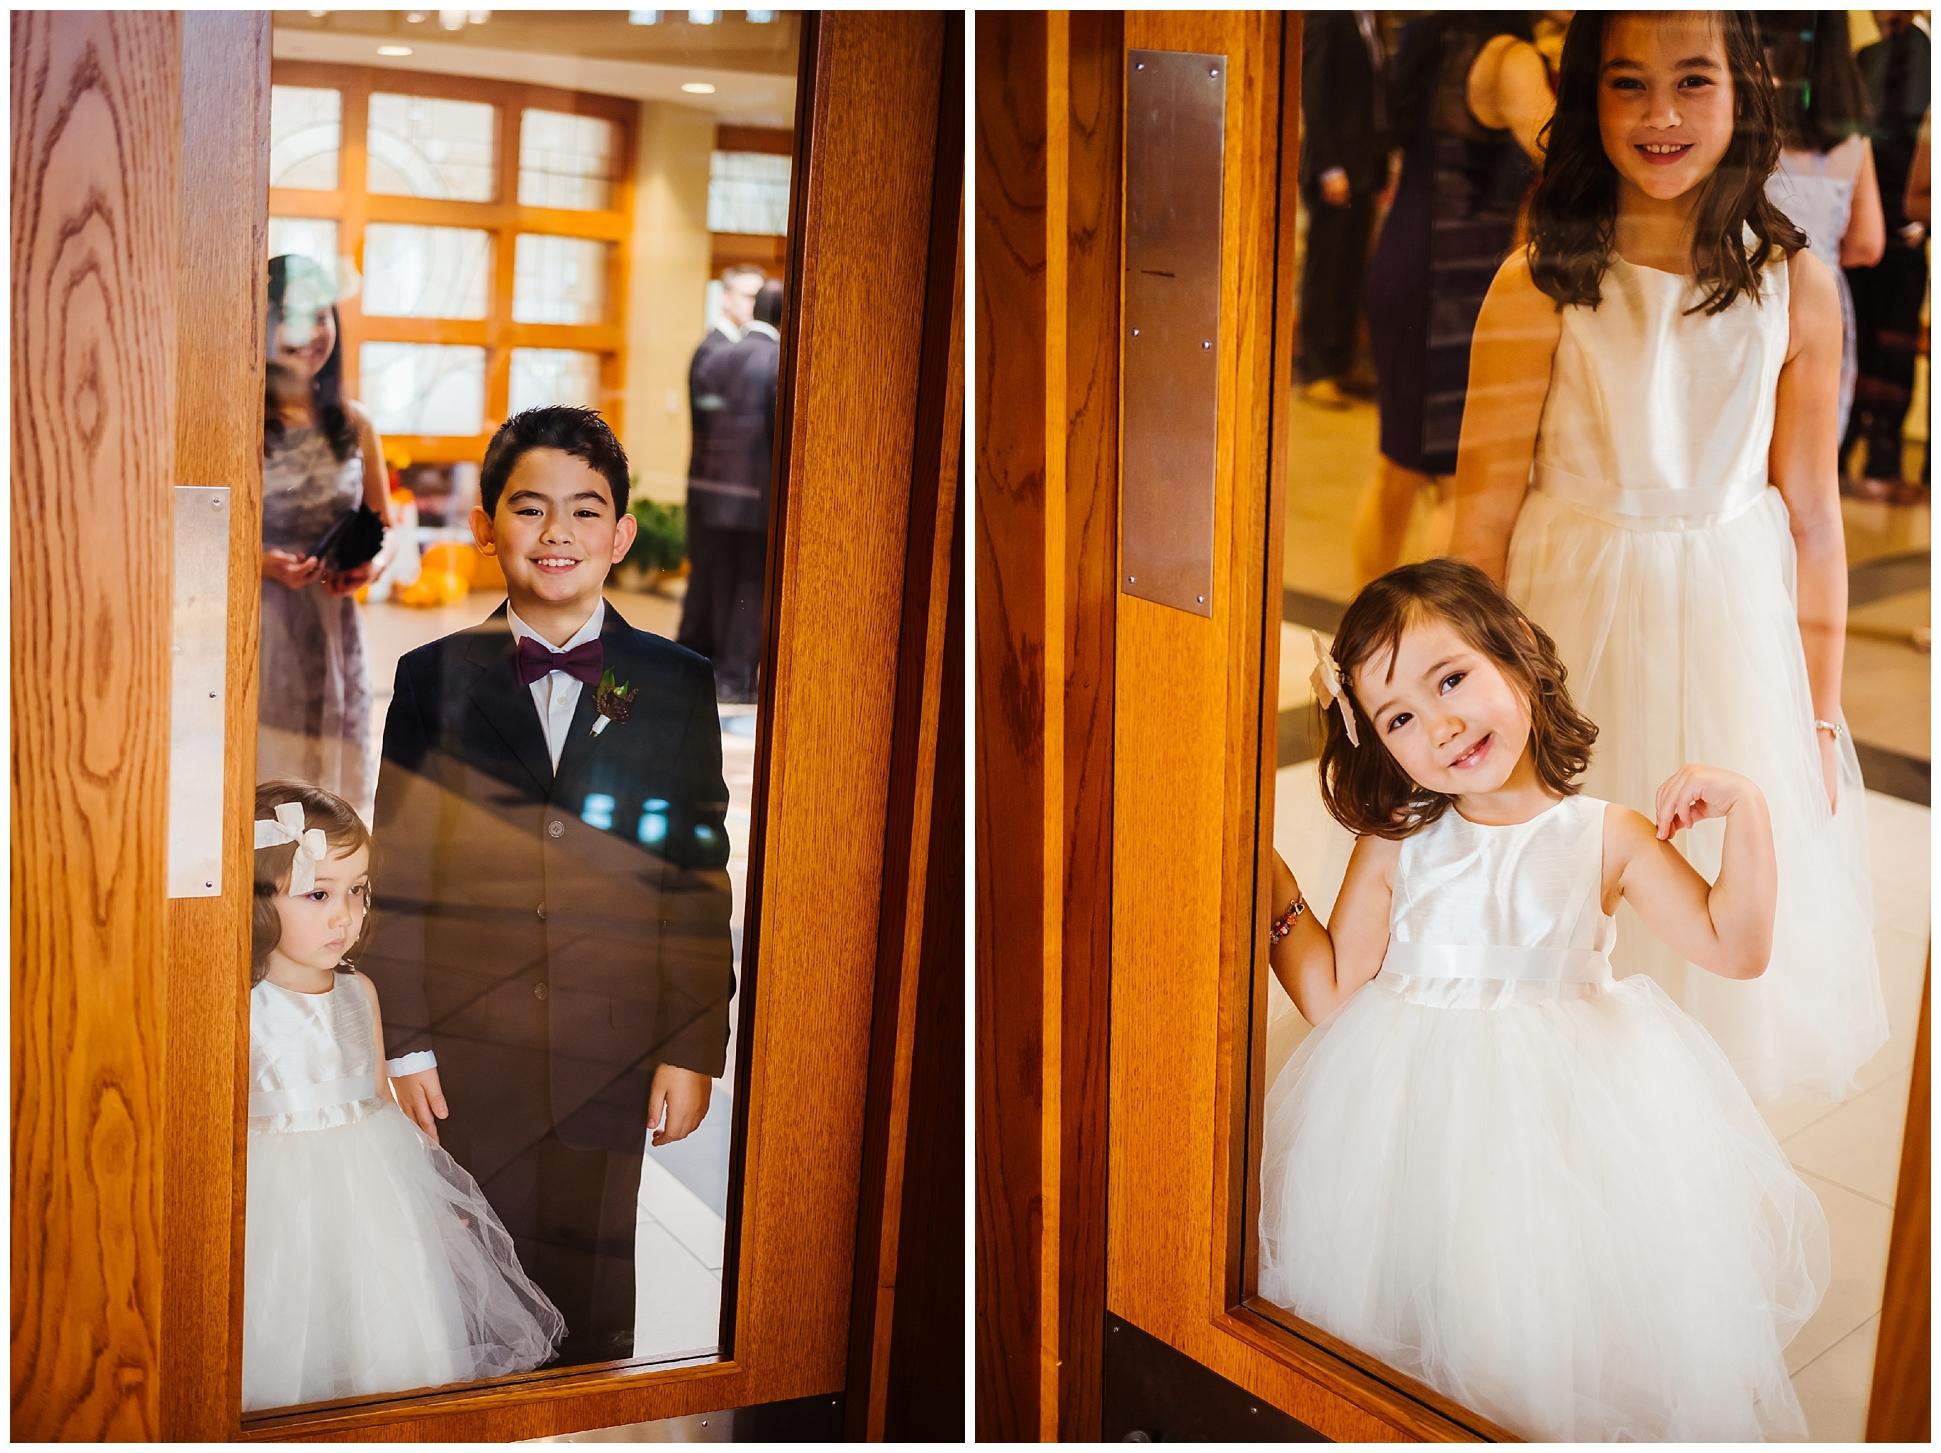 tampa-wedding-photographer-philipino-colorful-woods-ballroom-church-mass-confetti-fuscia_0025.jpg